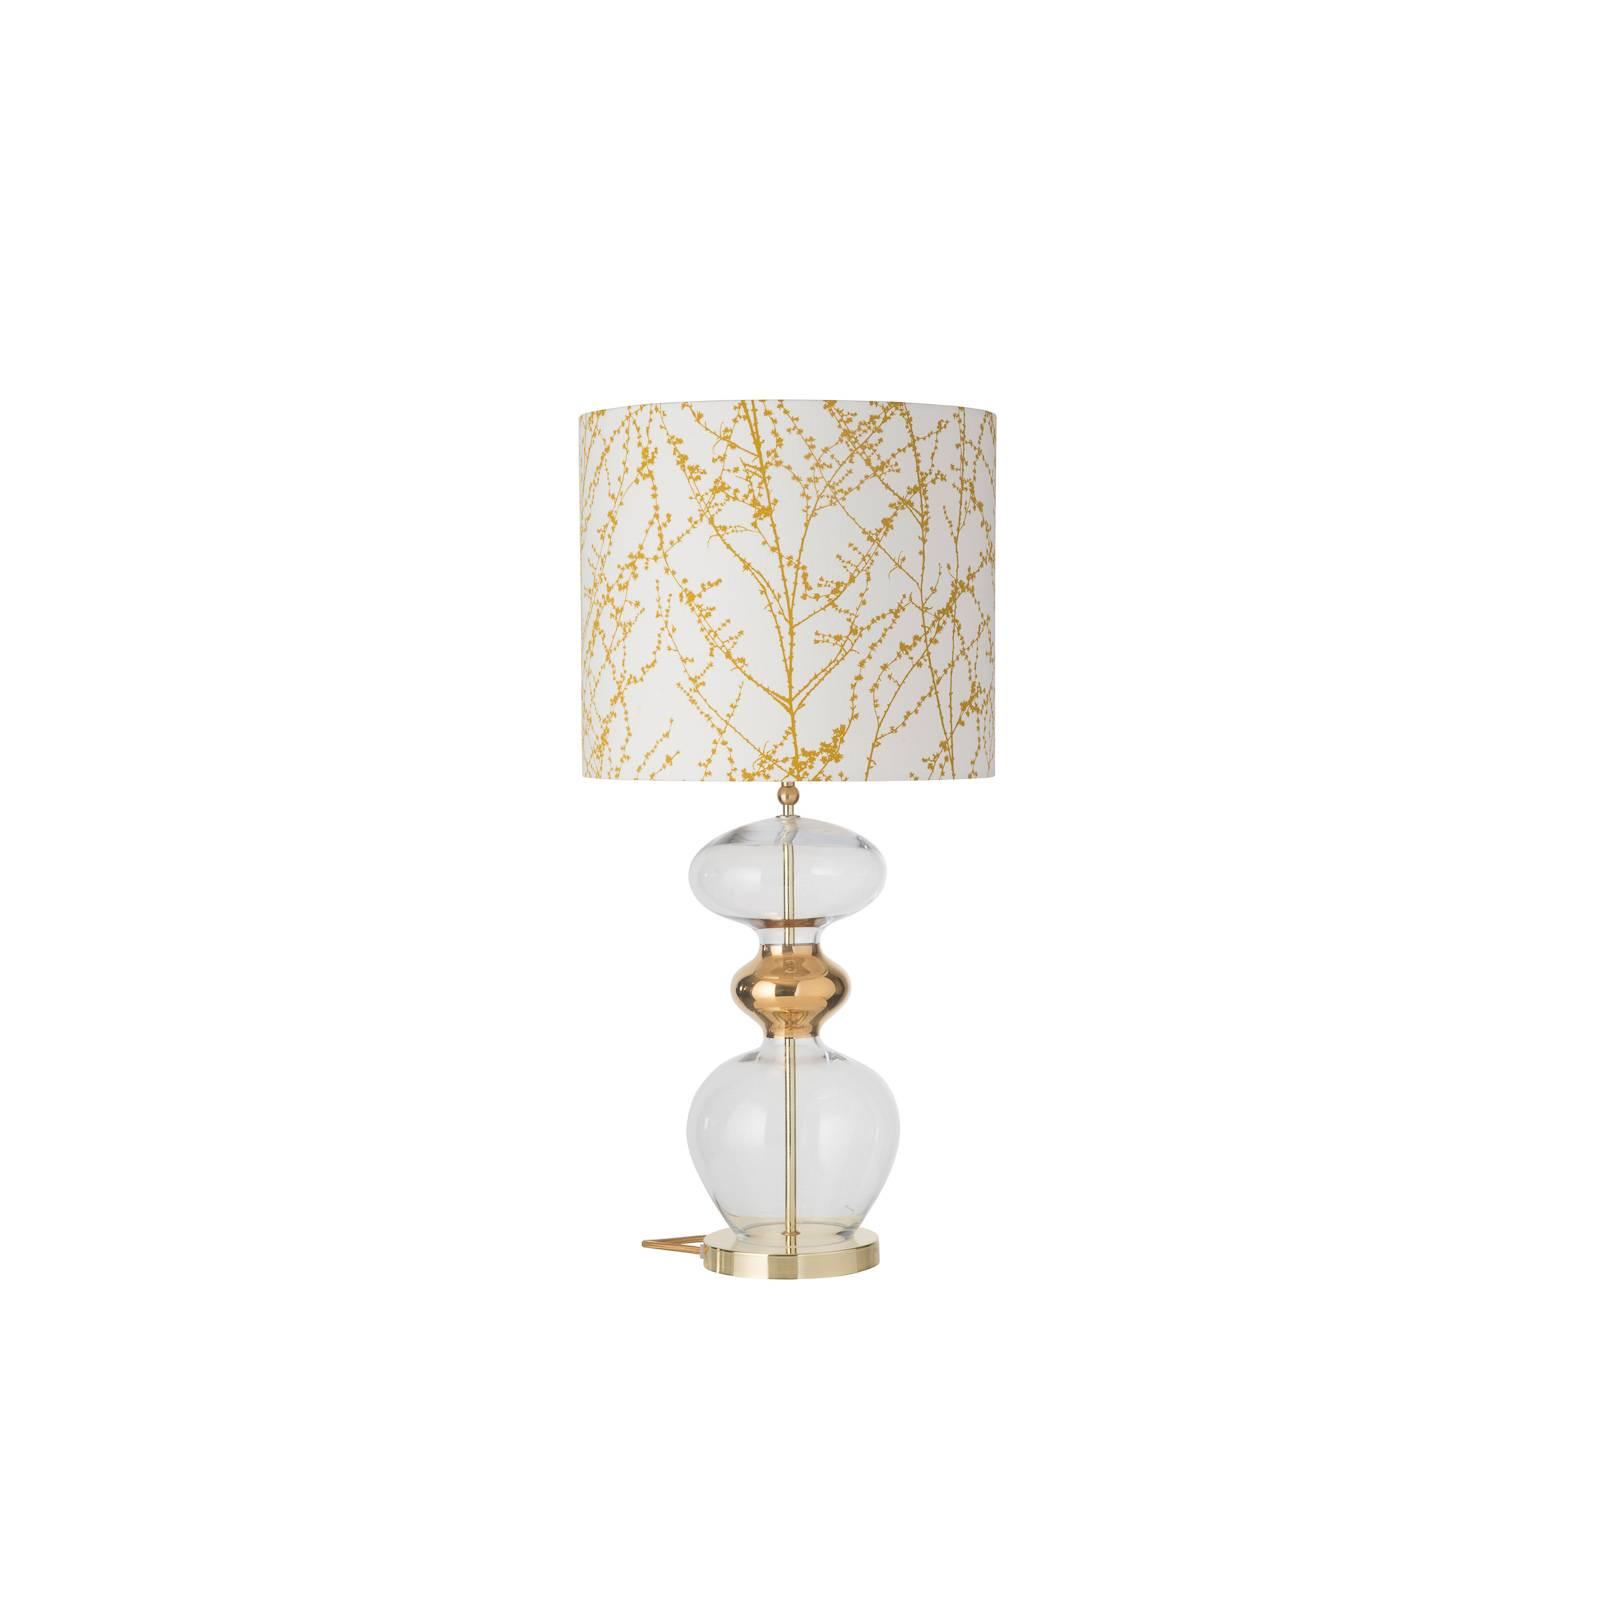 EBB & FLOW Futura lampe à poser, ochre/gold